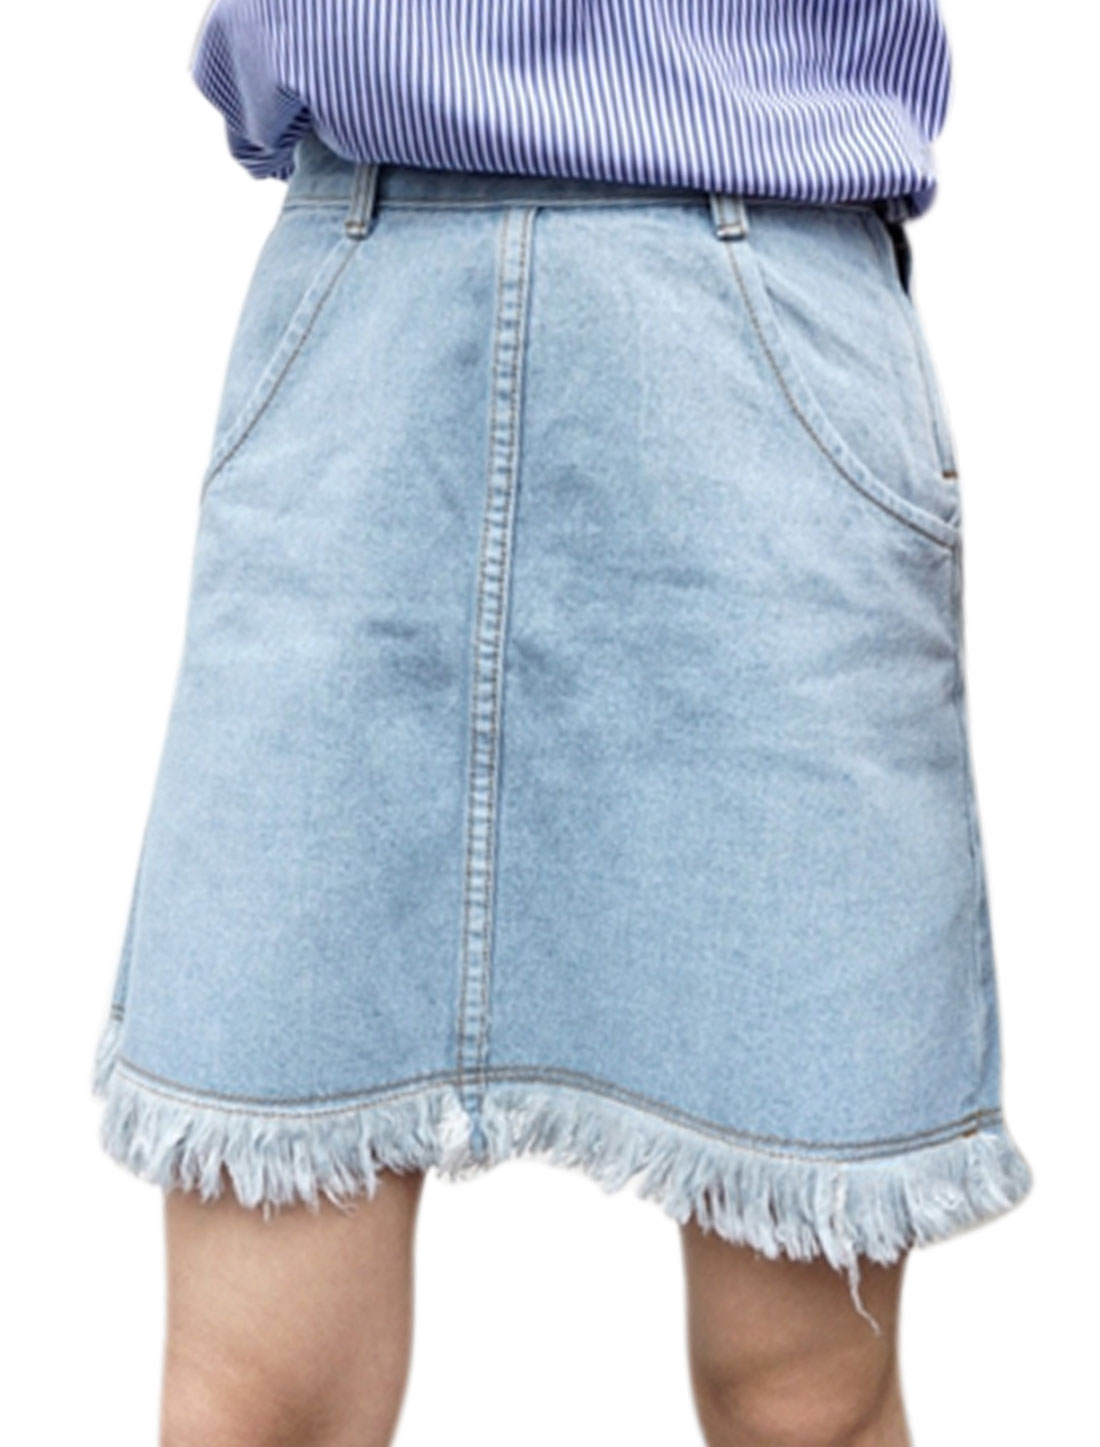 Women Pockets Front Frayed Hem Zip Up Side Denim A-Line Skirt Baby Blue M